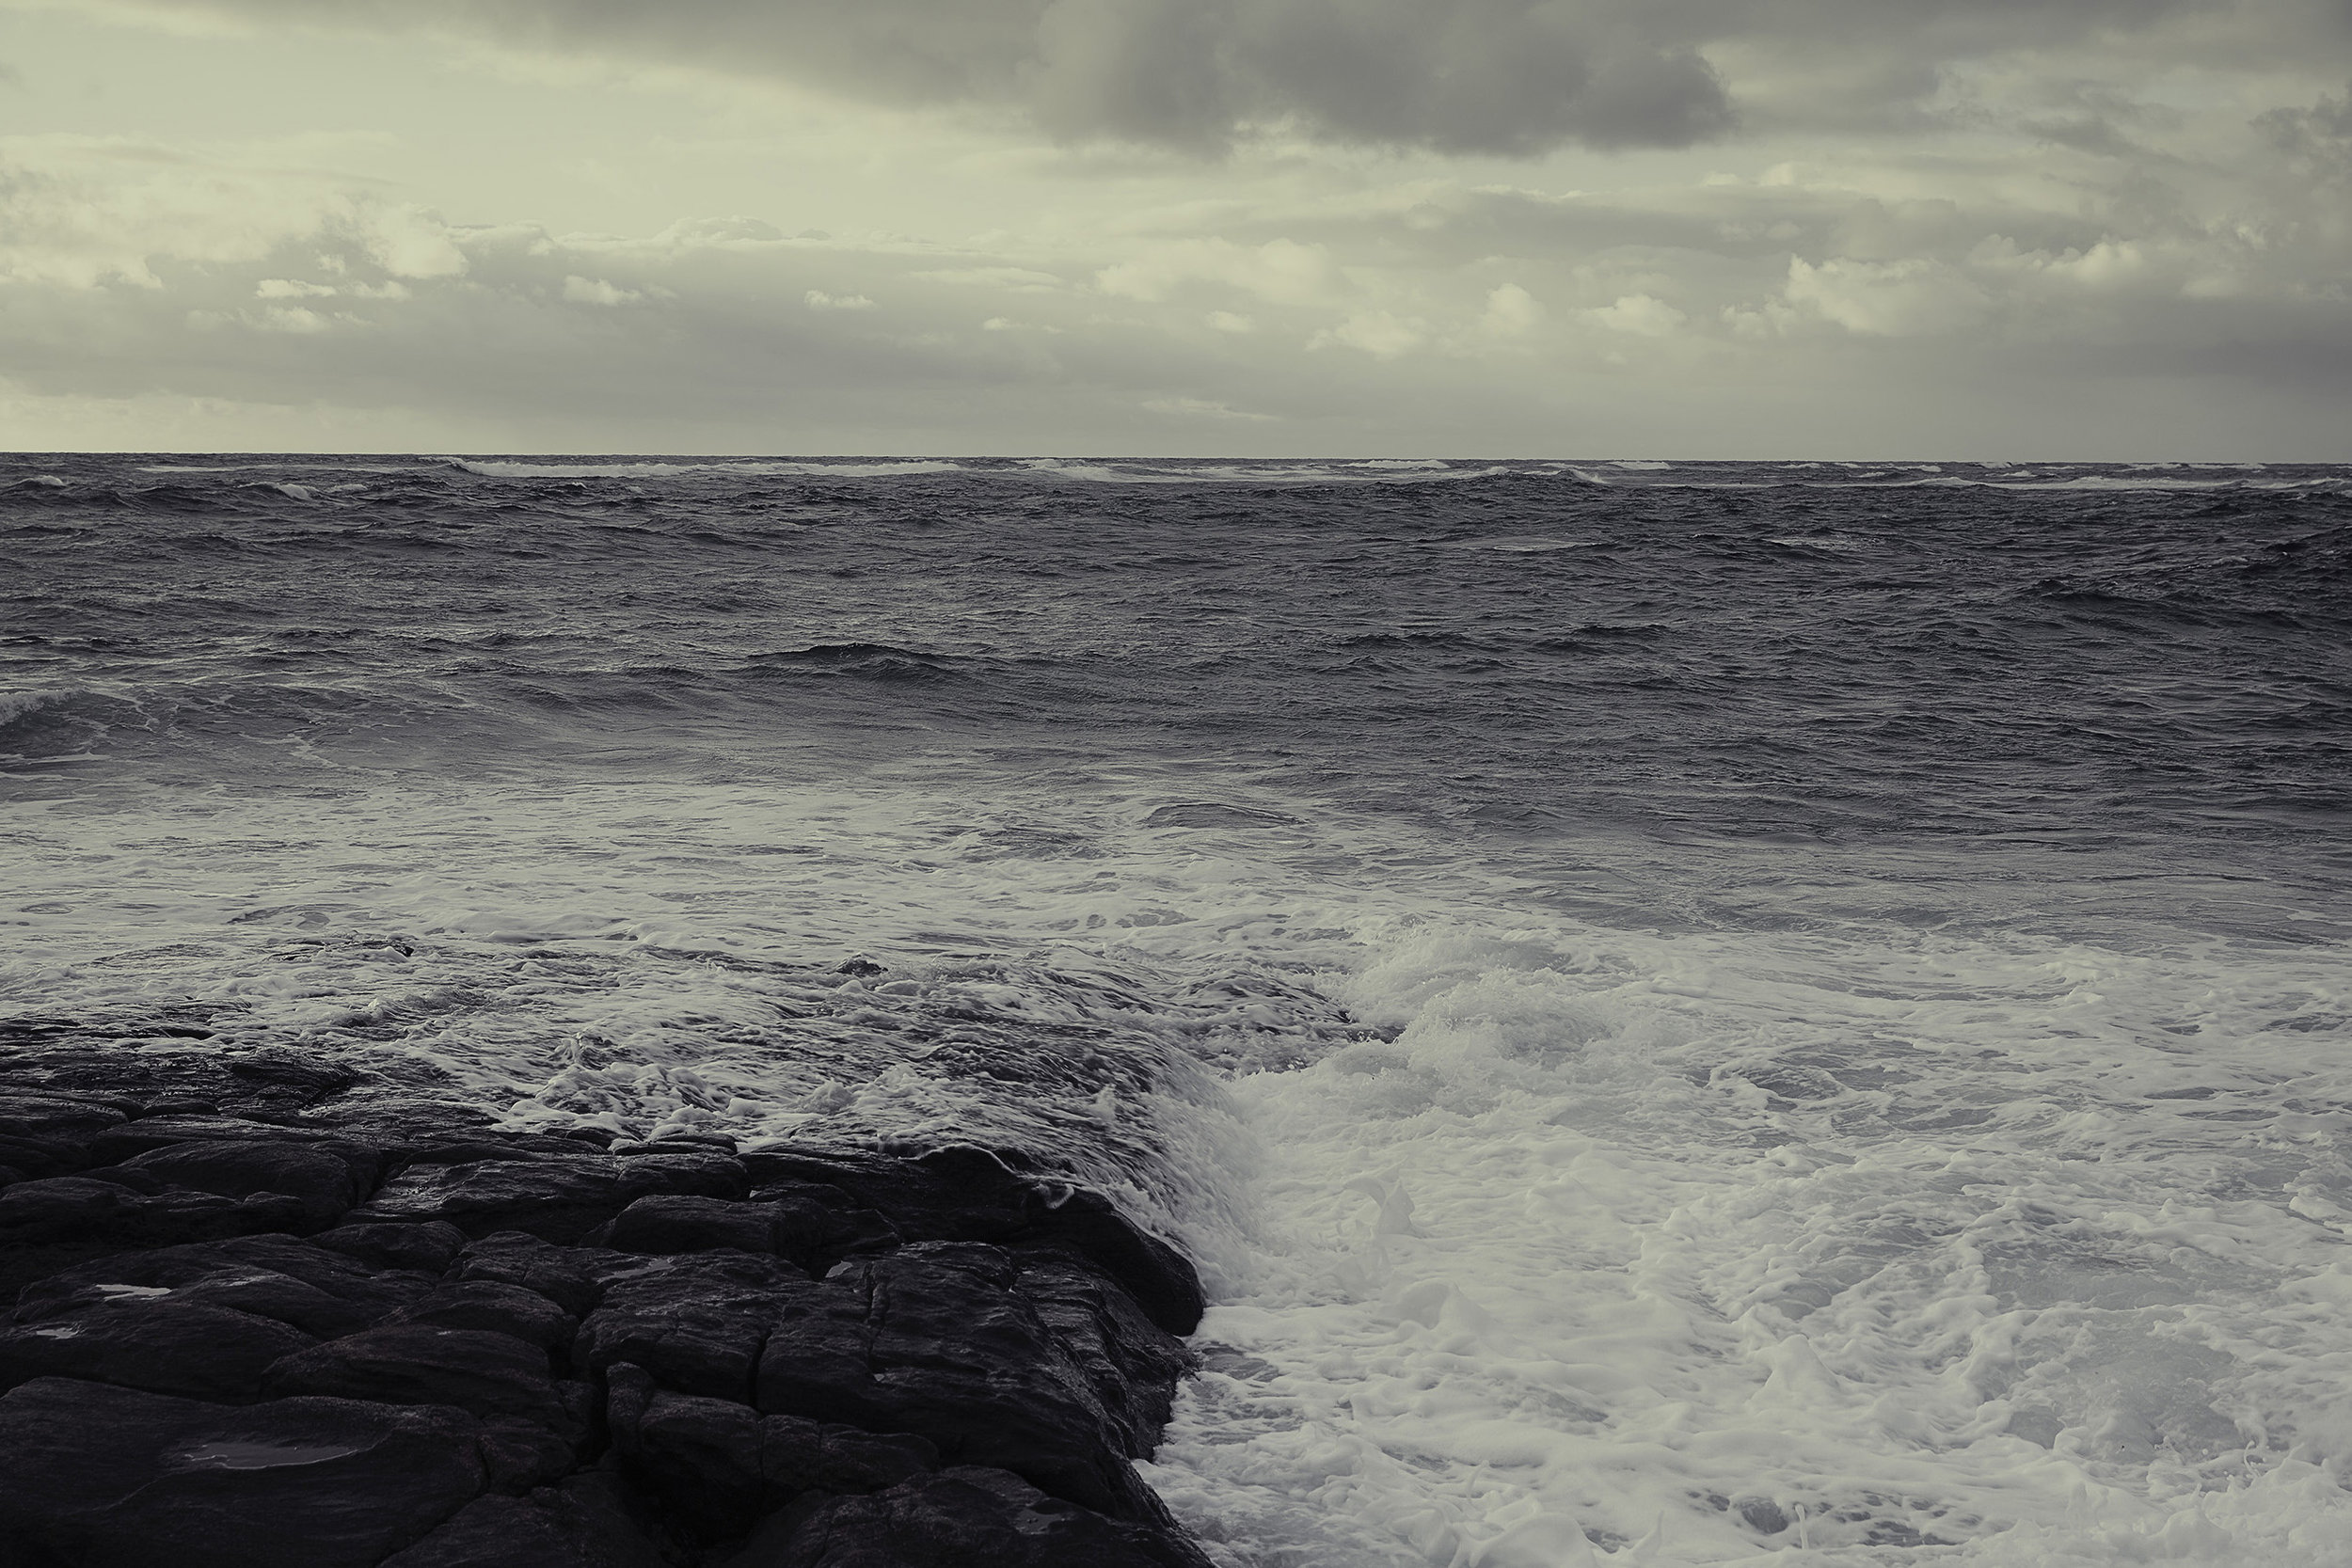 Patrick_Schuttler_Landscape_027.jpg